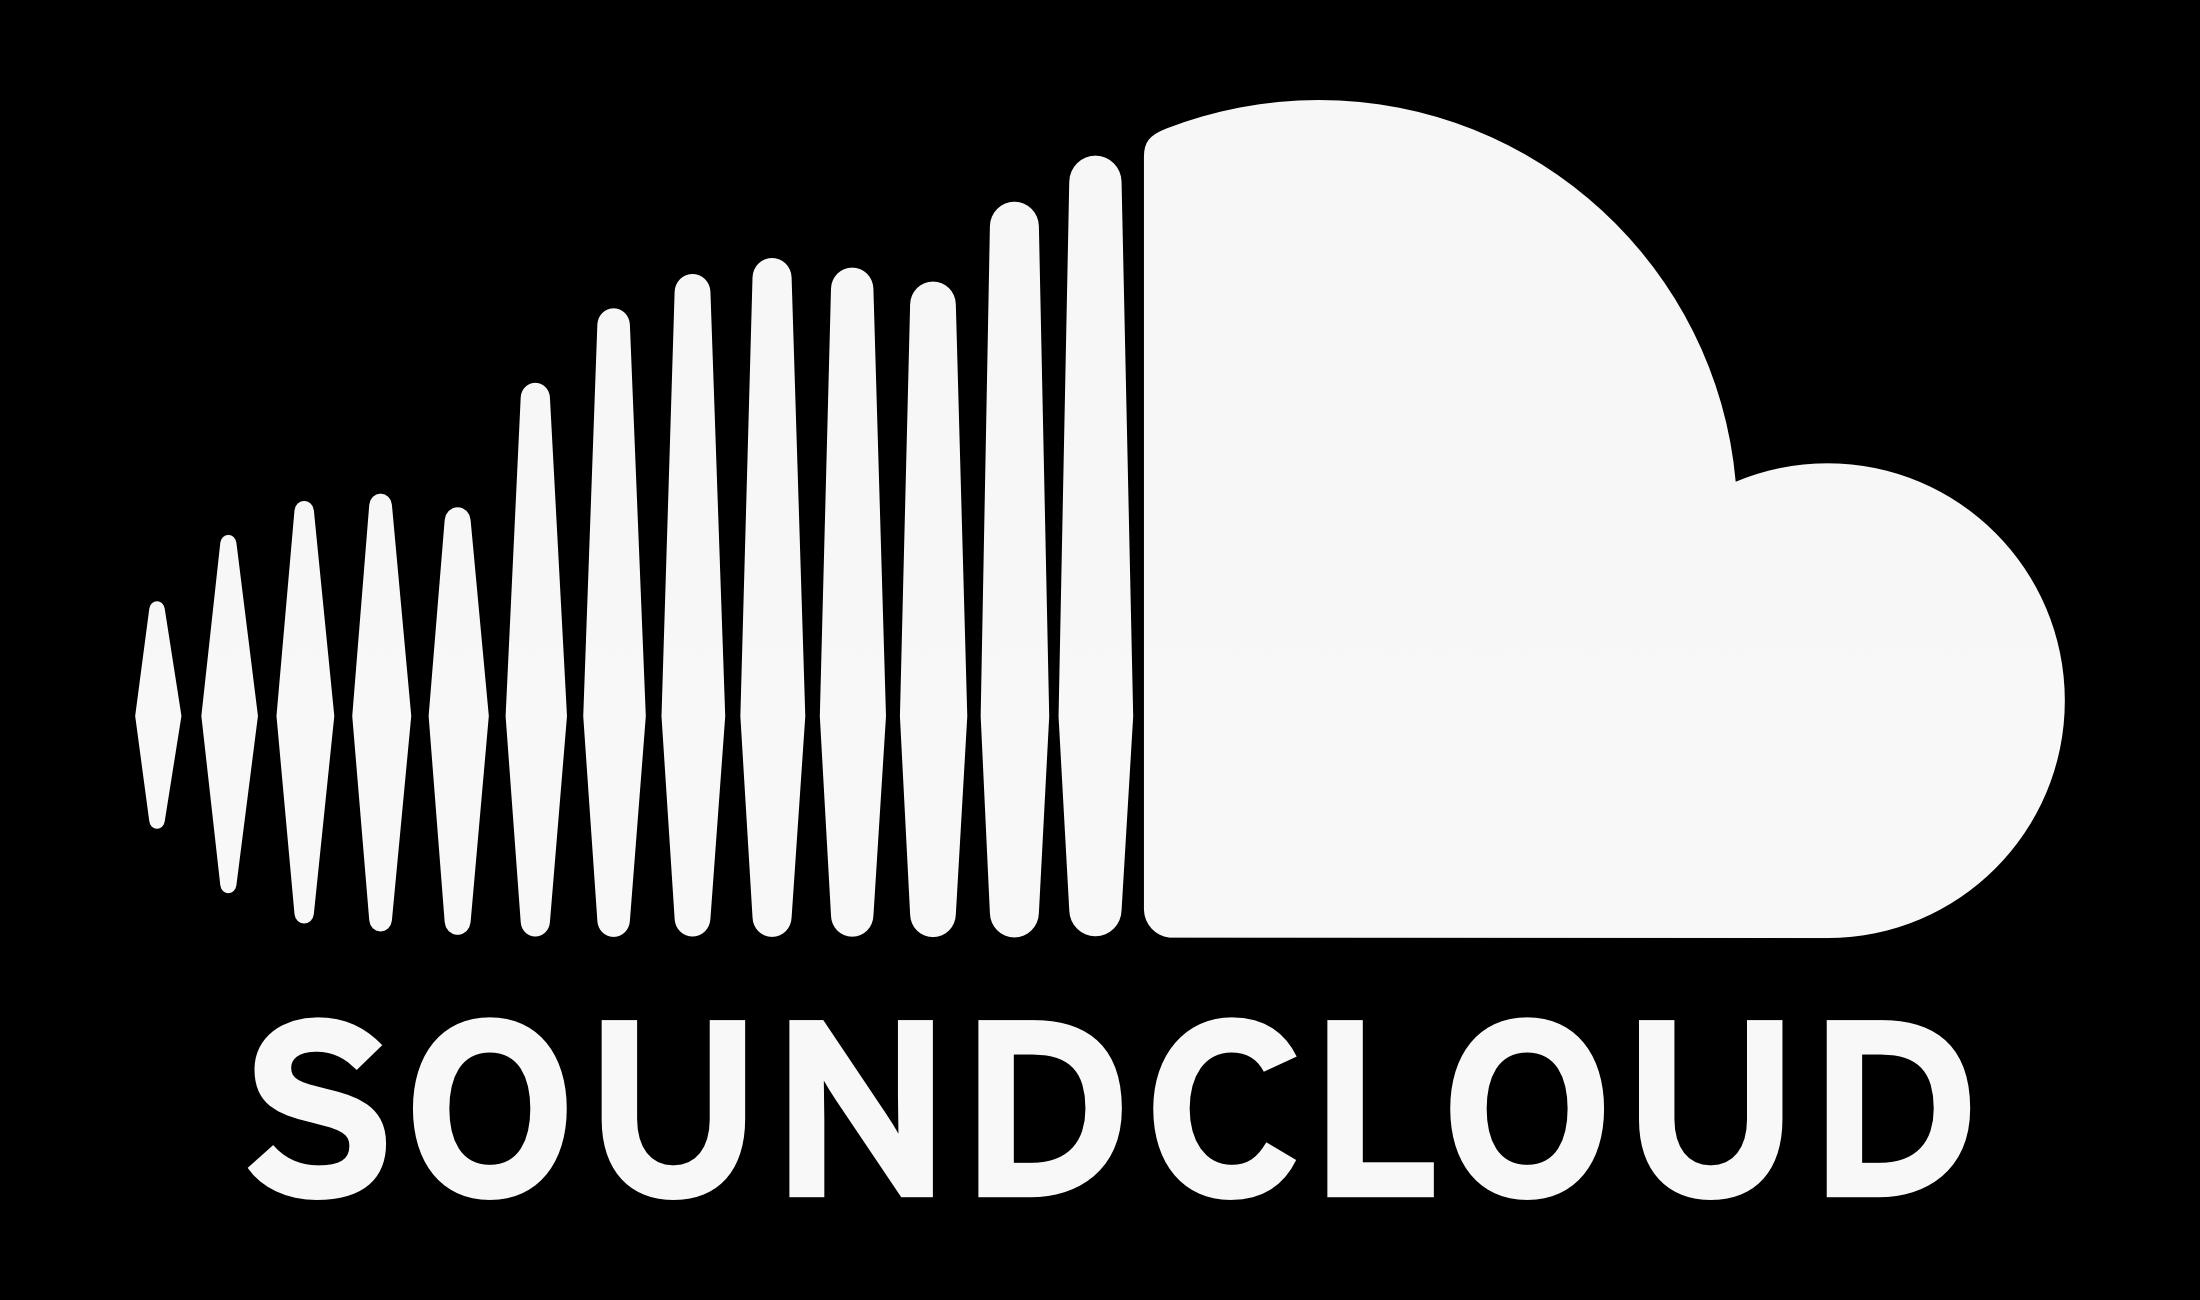 Kleingedrucktes: Die harten Verträge des SoundCloud Monetizing-Programm